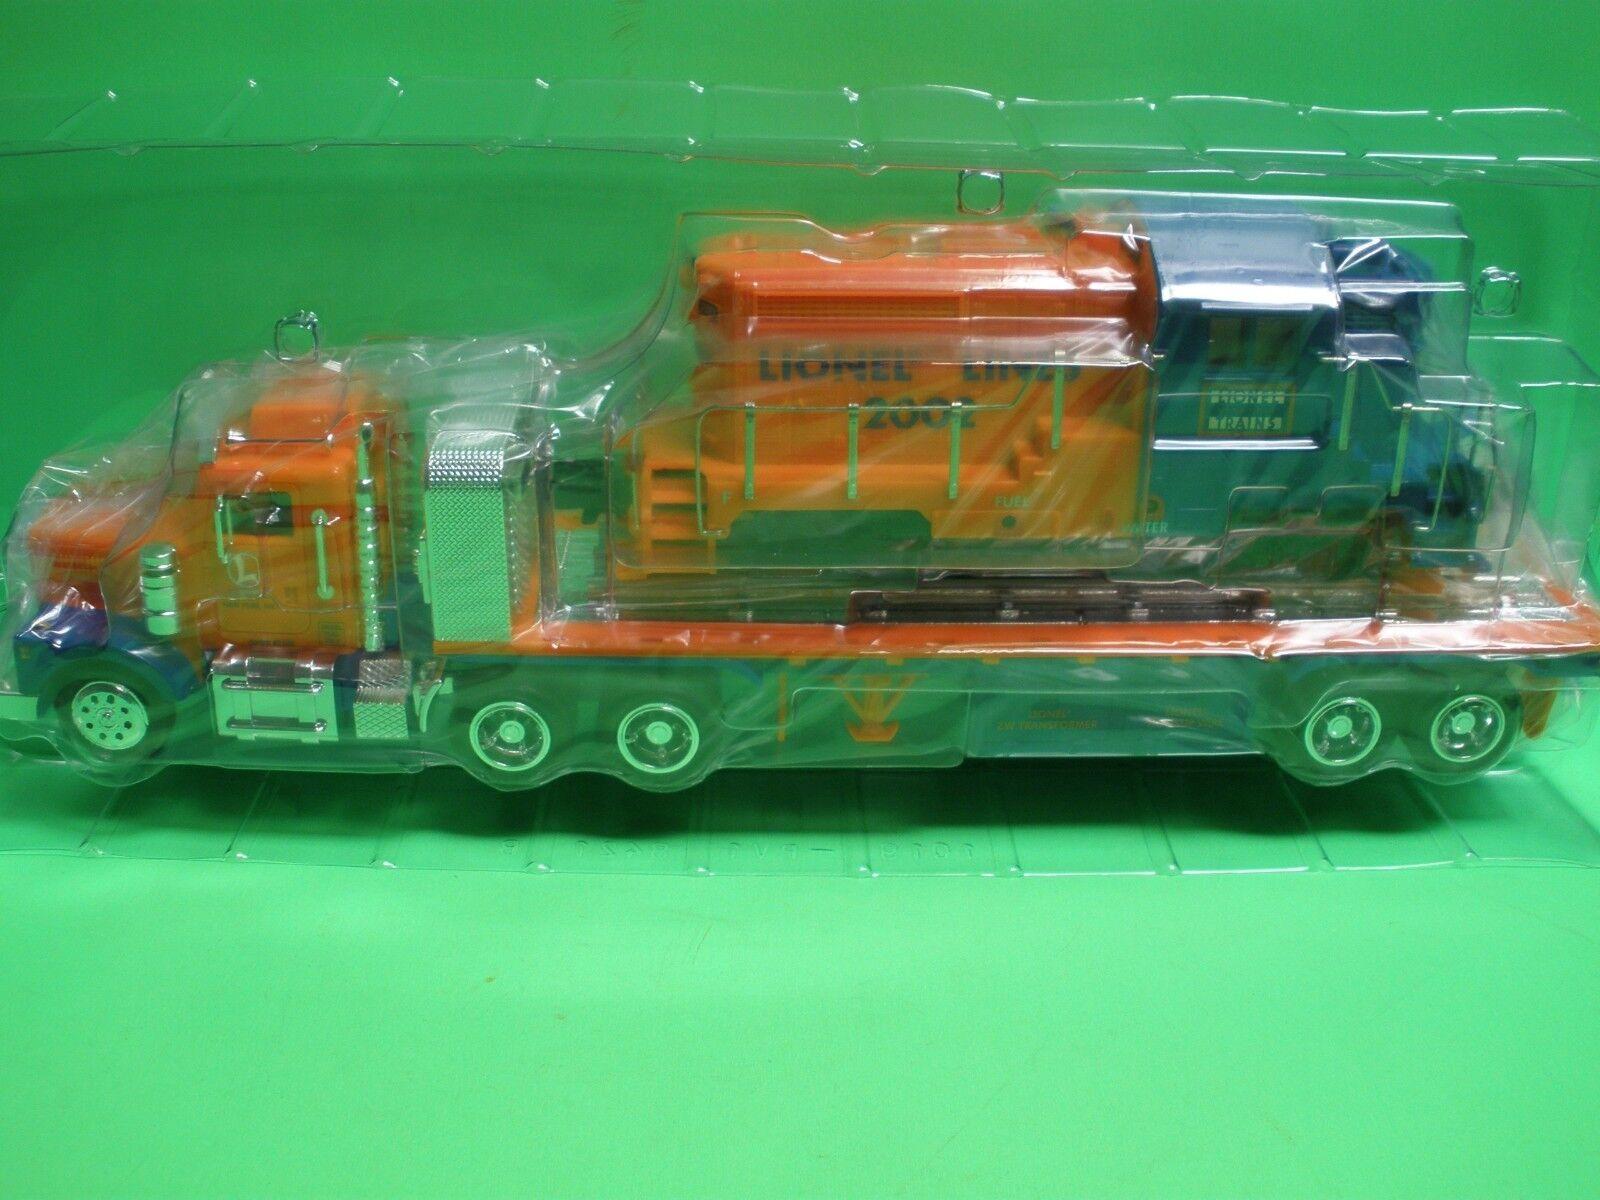 Lionel Trains Taylor Made camion à plate-forme & KUSAN Diesel locomotive wagon